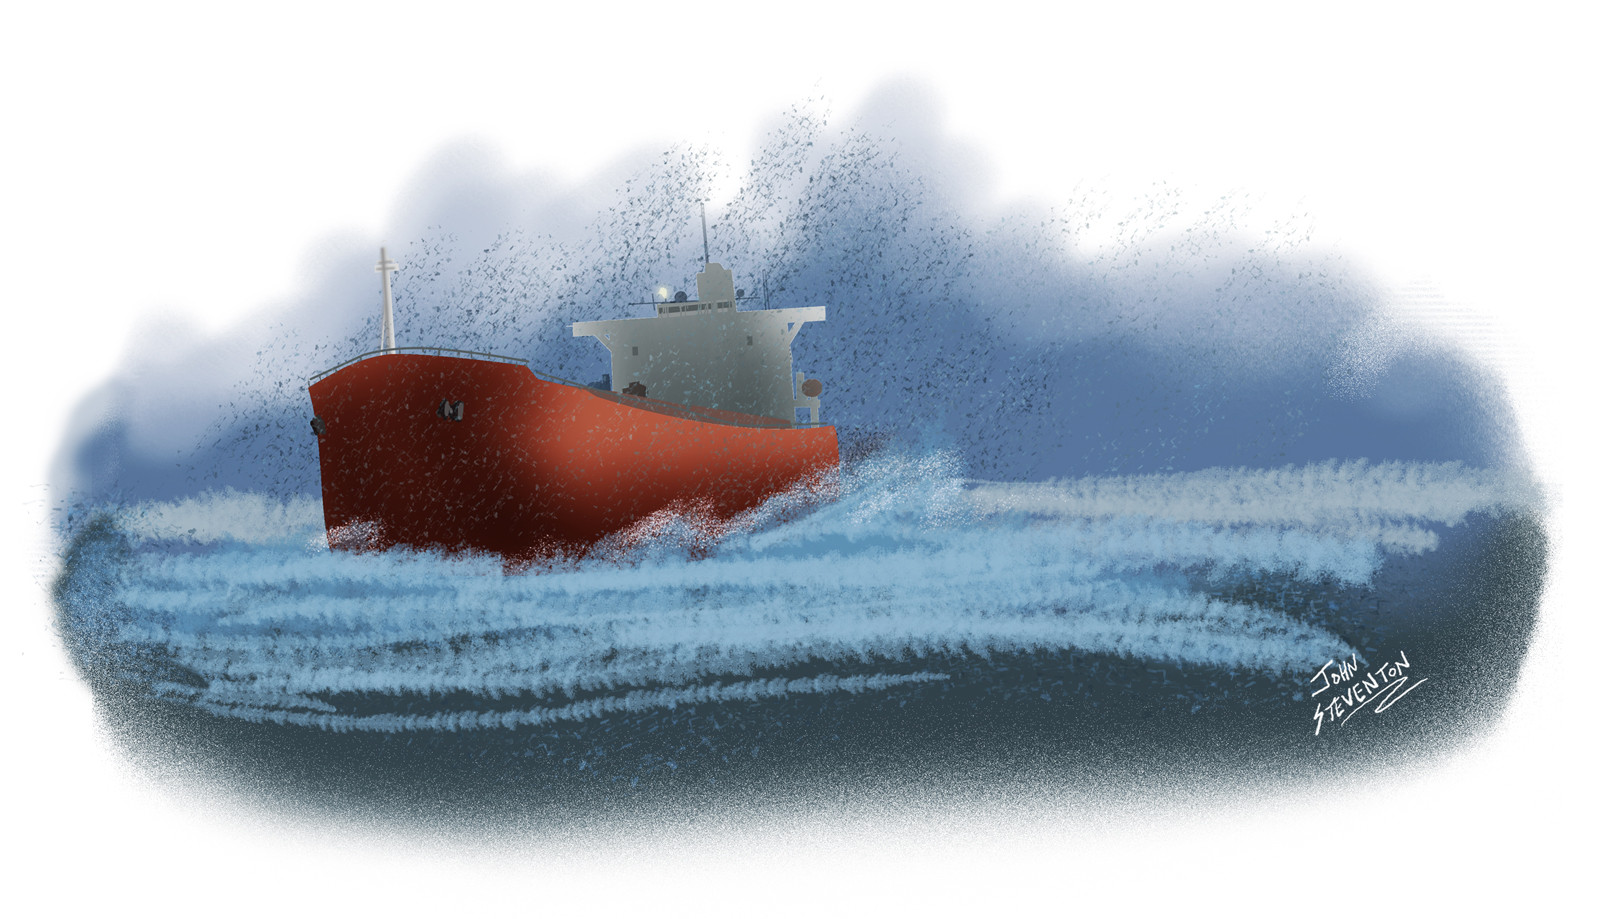 Ship In Distress